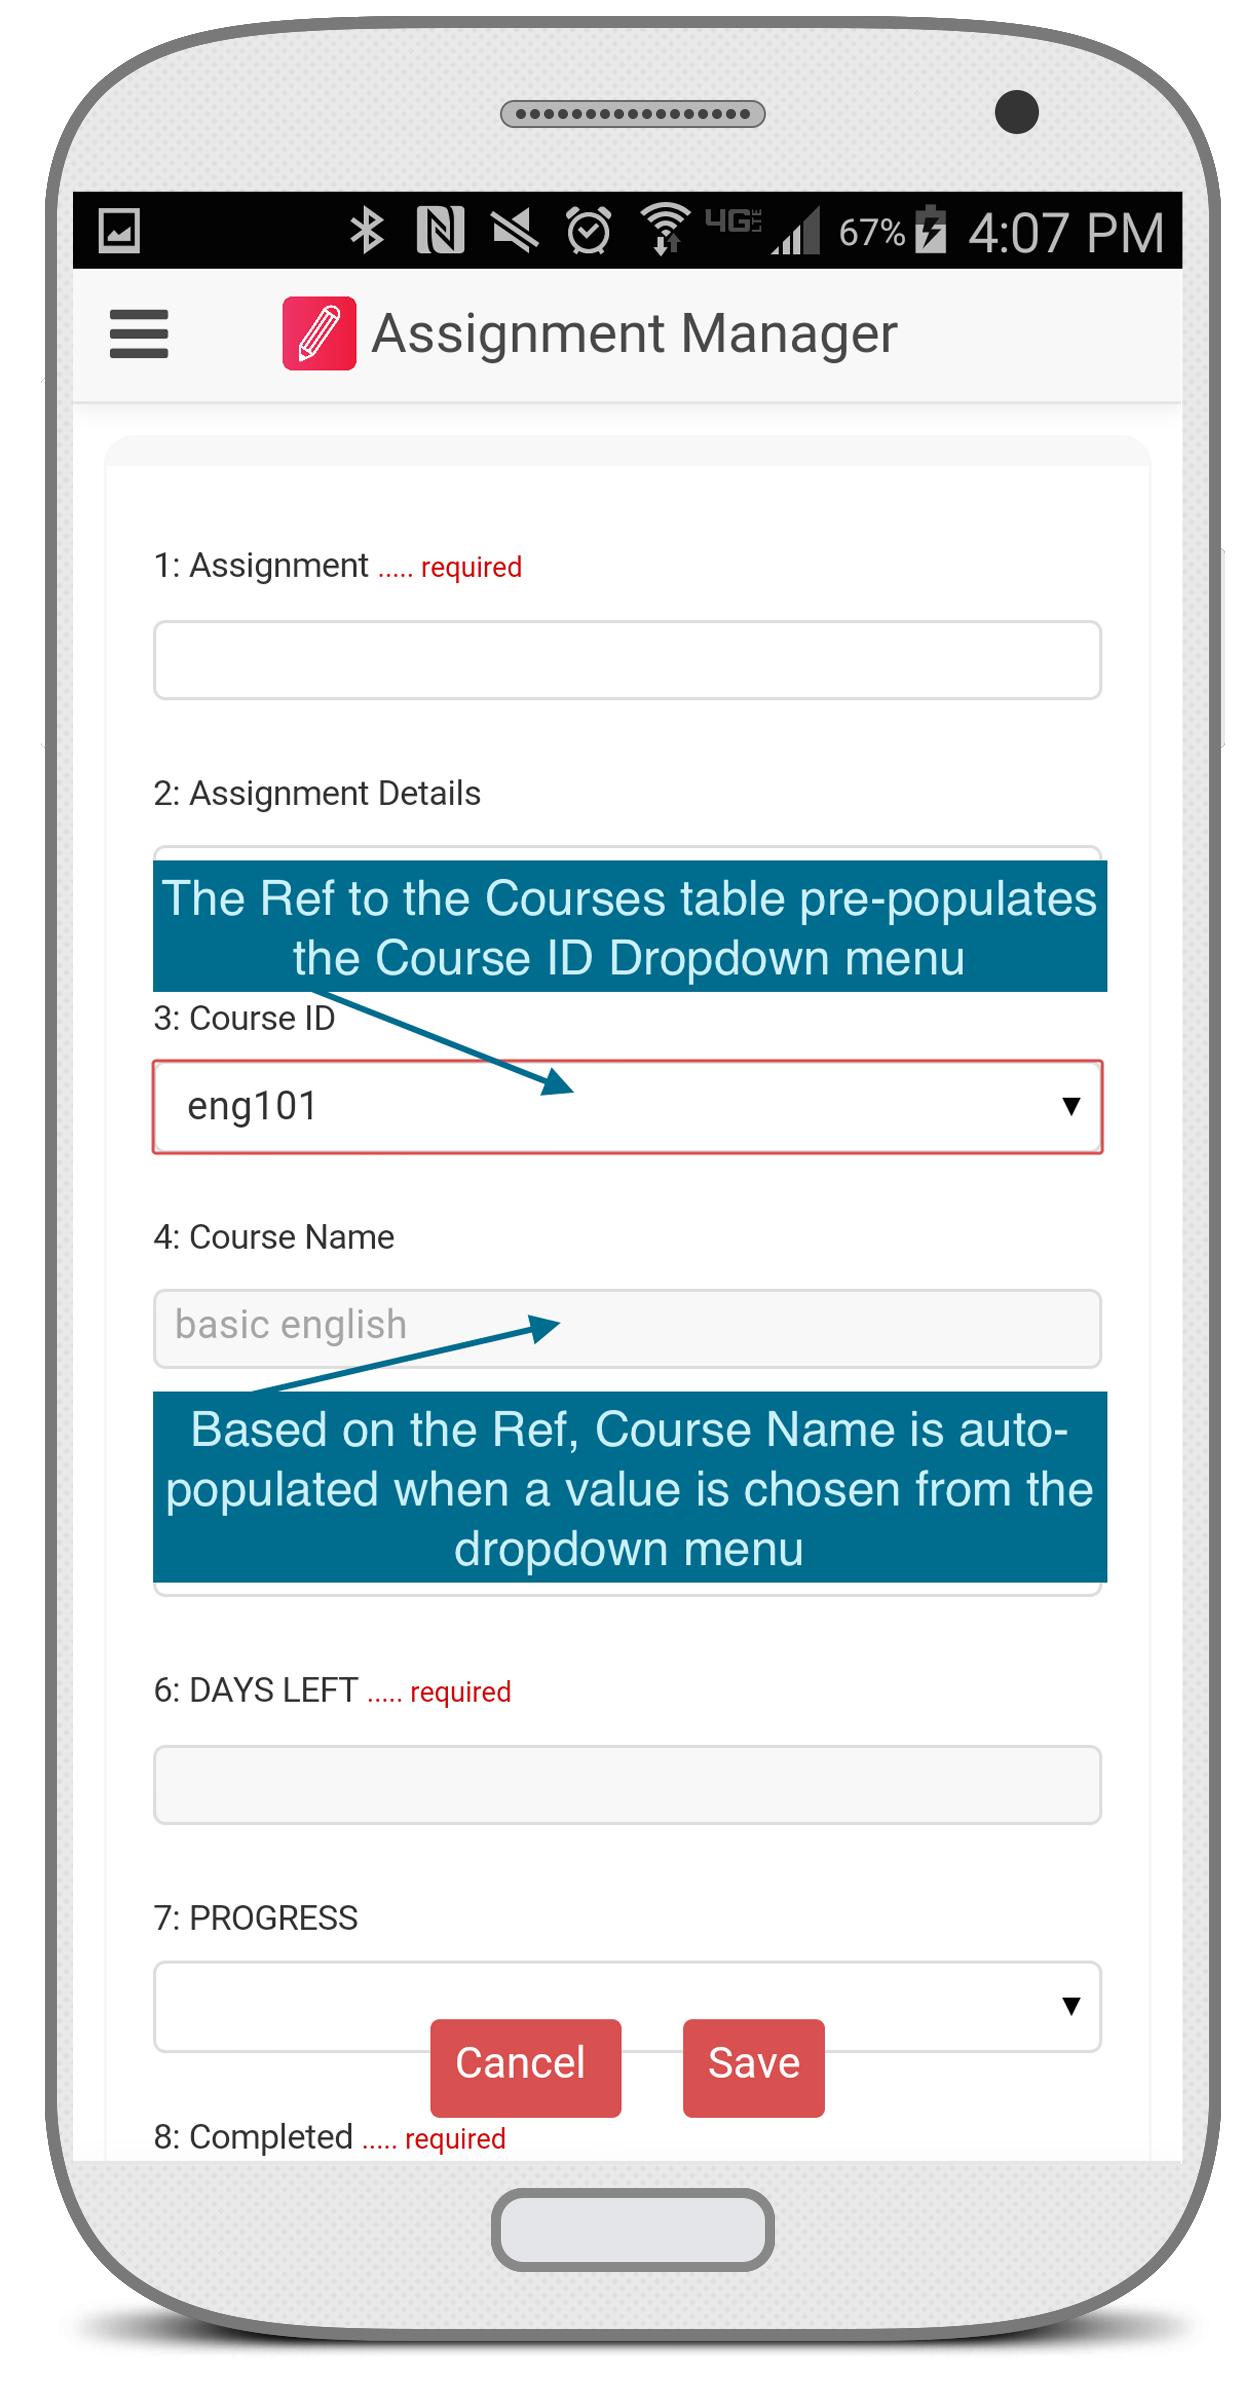 University assignments custom orders